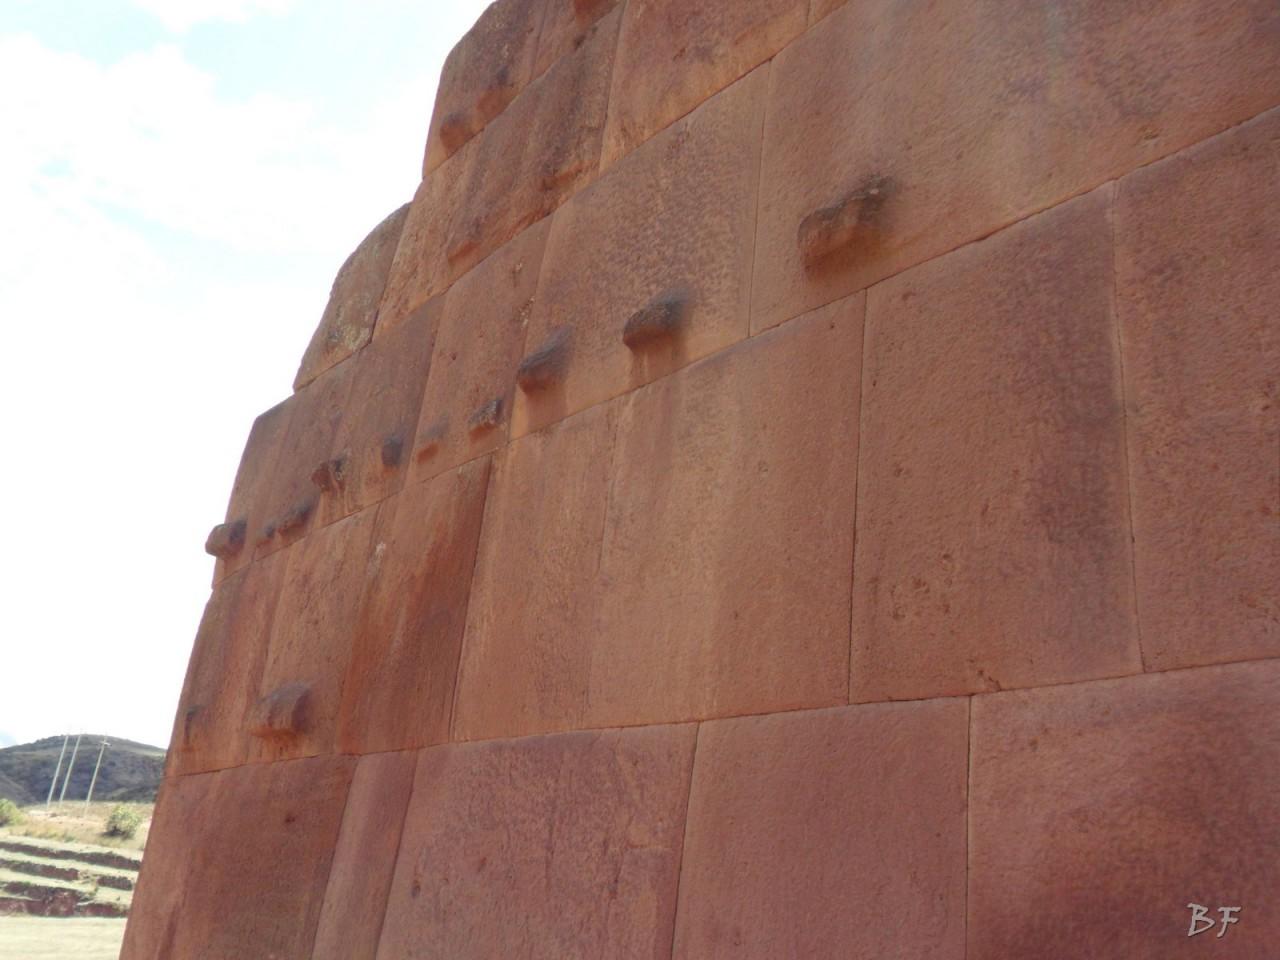 Parco-Archeologico-Megaliti-Rumicolca-Cusco-Perù-17